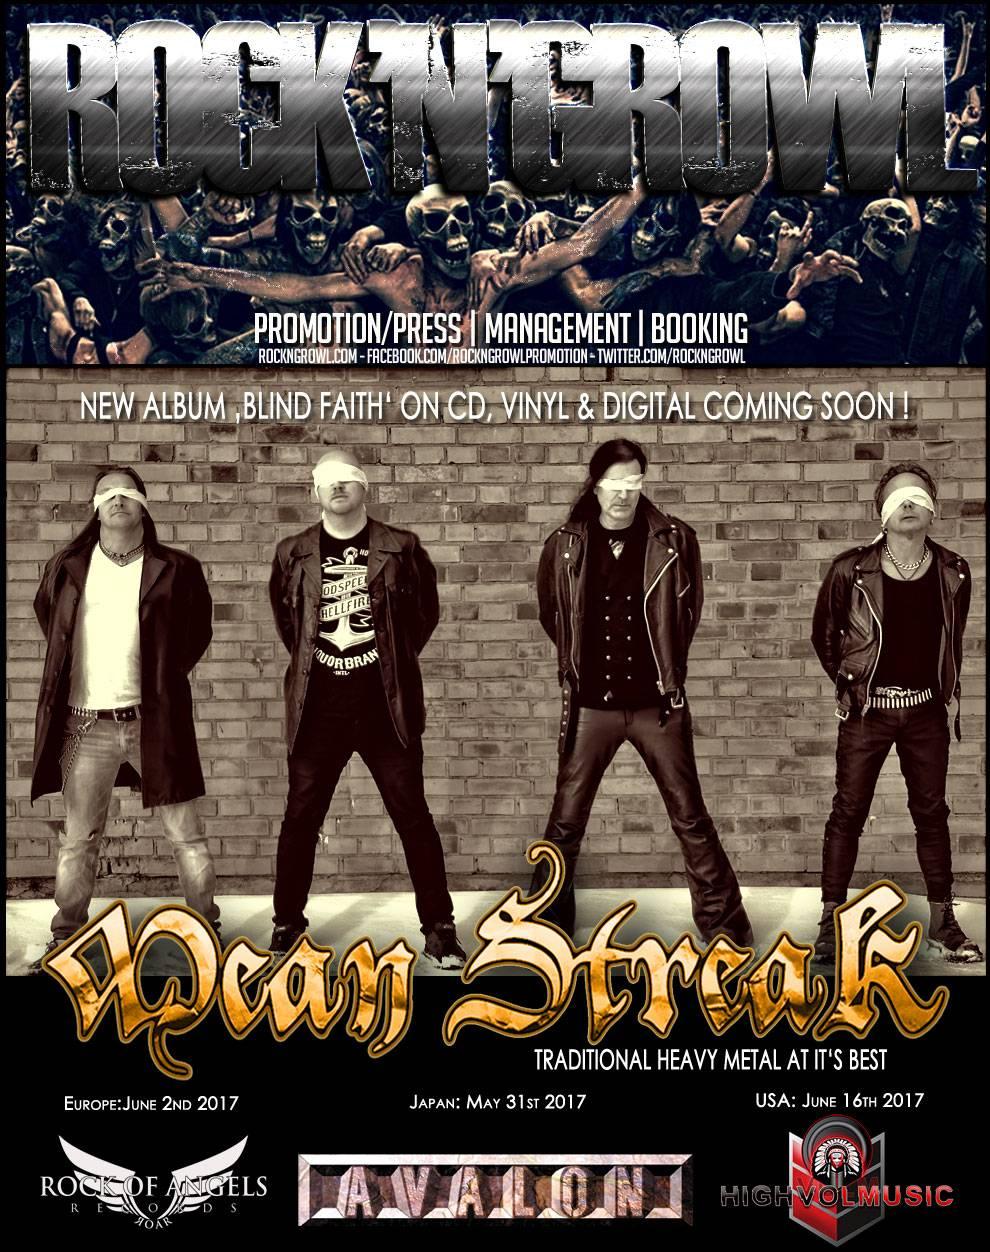 Mean Streak Blind Faith Album